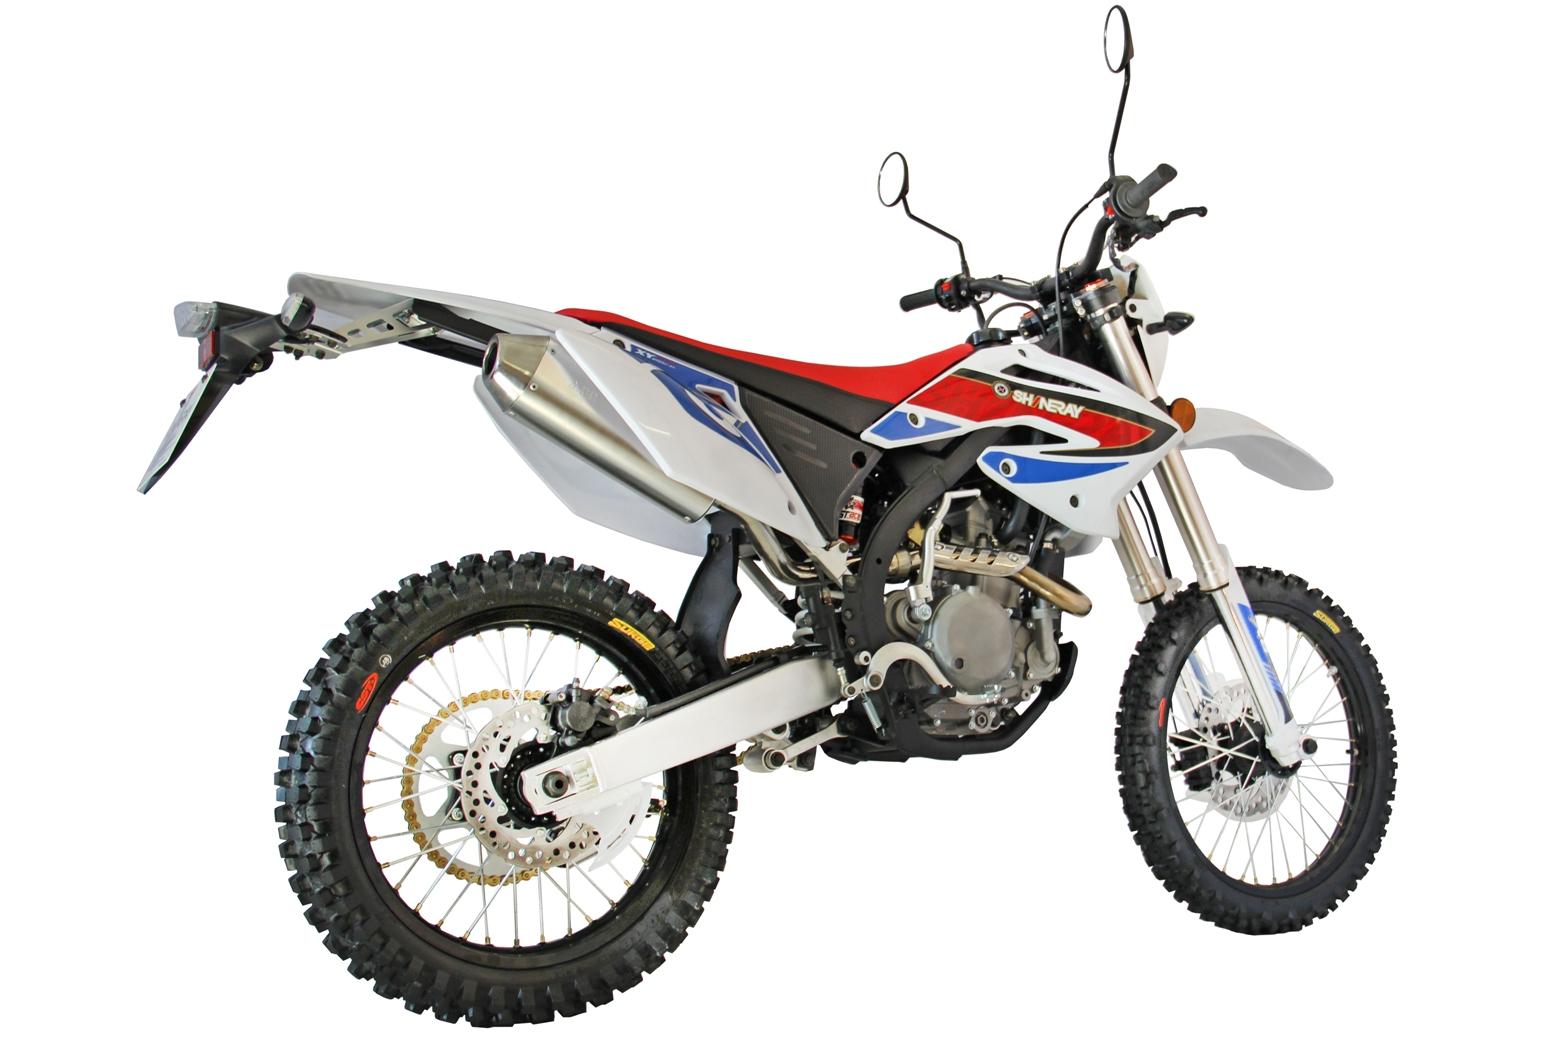 МОТОЦИКЛ SHINERAY XY 250GY-7 (X6) White ― Артмото - купить квадроцикл в украине и харькове, мотоцикл, снегоход, скутер, мопед, электромобиль